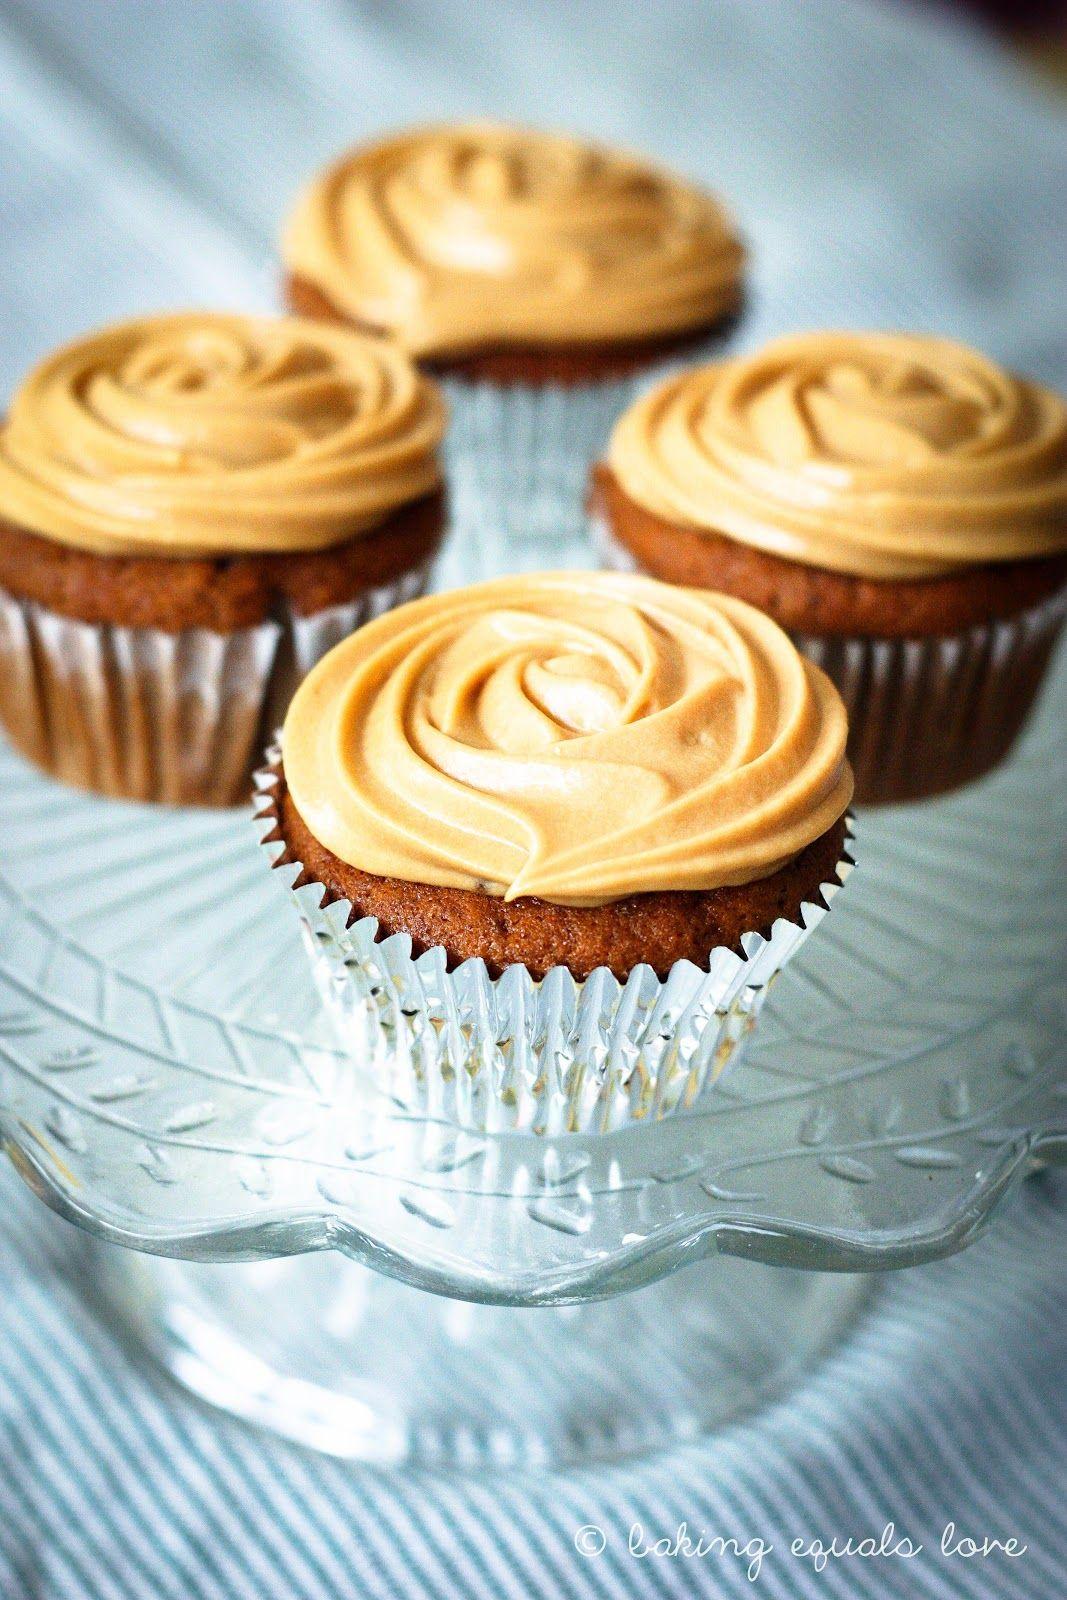 baking = love: Sticky Date & Dulce de Leche Cupcakes with Homemade Dulce de Leche